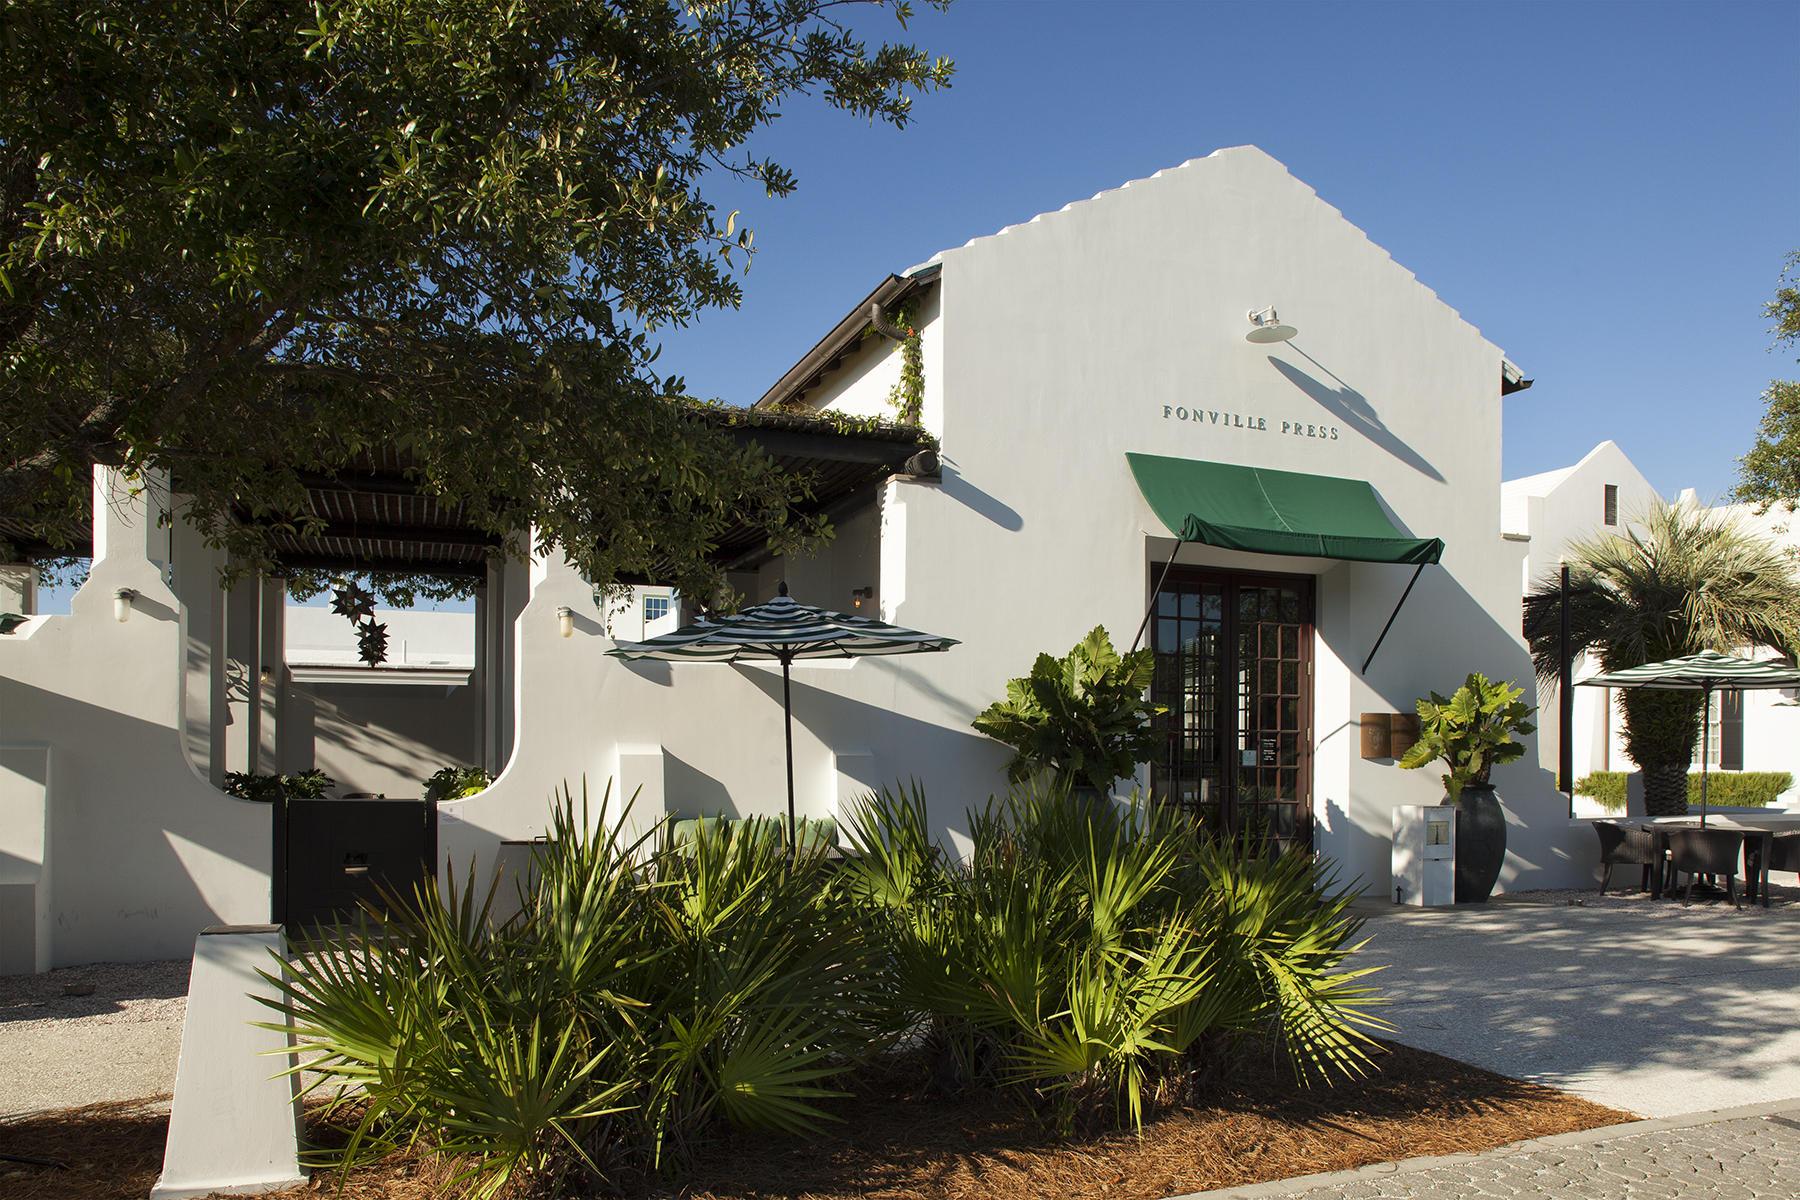 M8 Whalebone,Alys Beach,Florida 32461,Vacant land,Whalebone,20131126143817002353000000